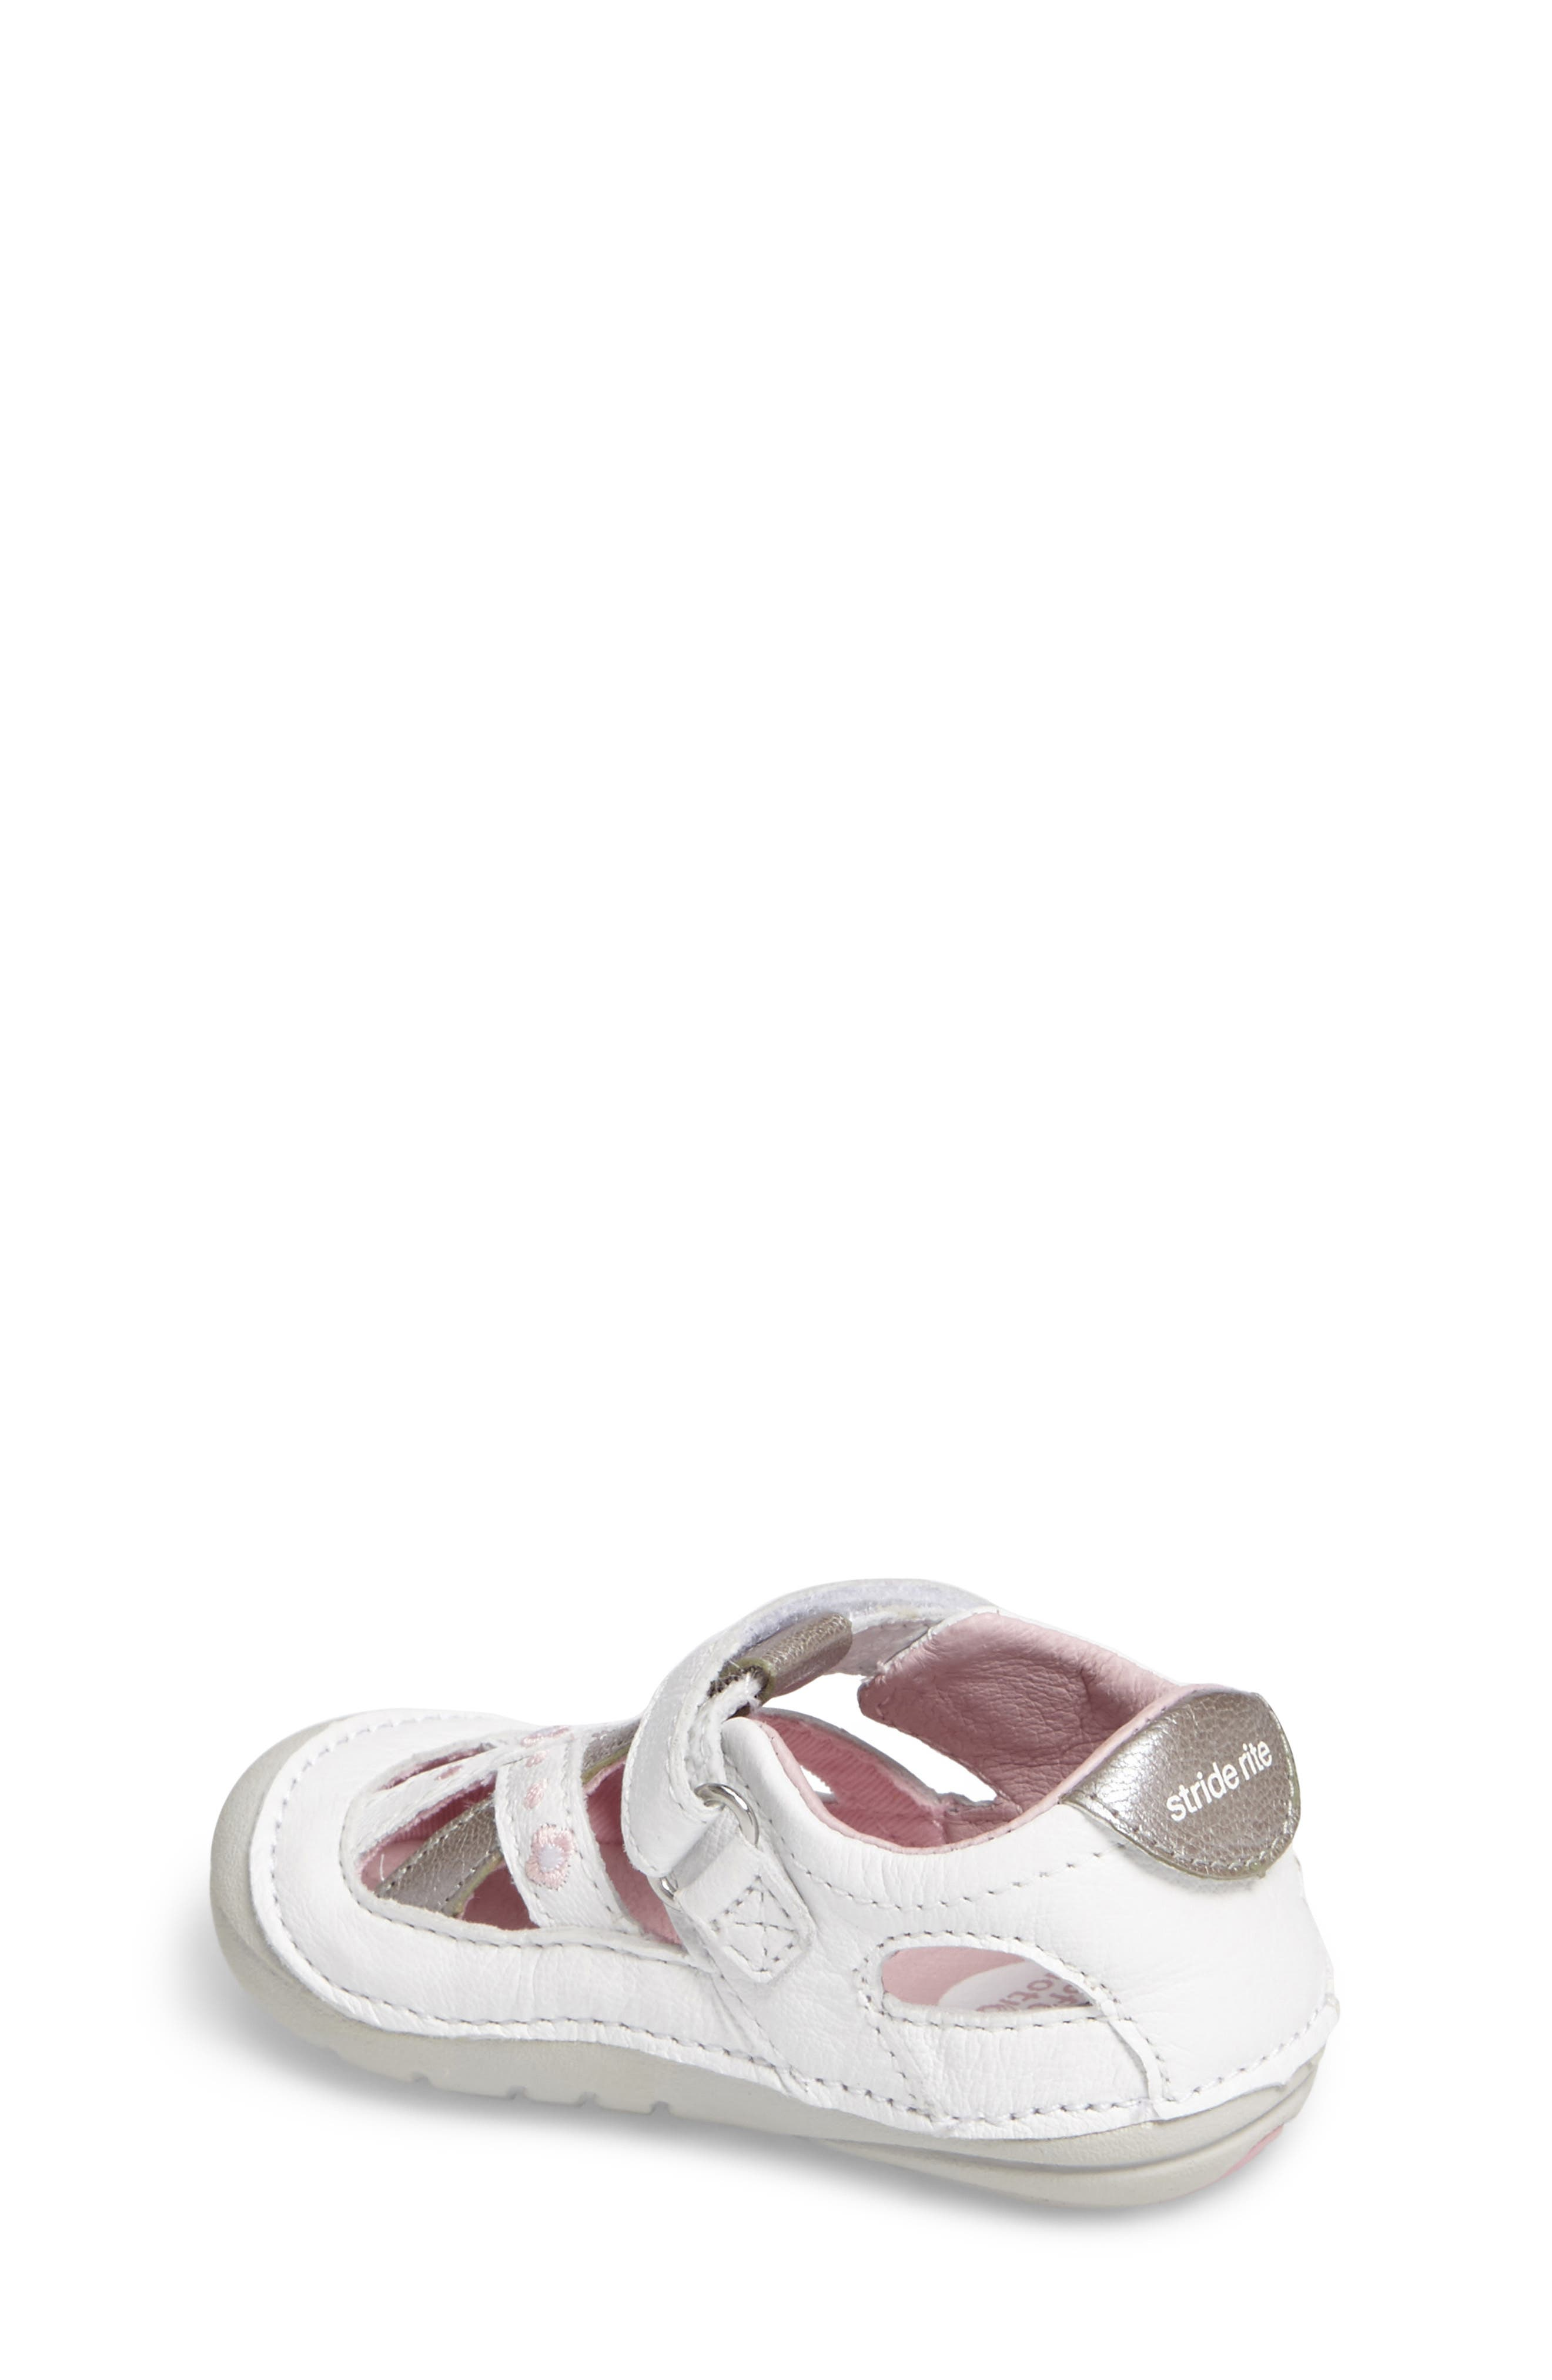 STRIDE RITE,                             Kiki Embroidered Sneaker,                             Alternate thumbnail 2, color,                             WHITE